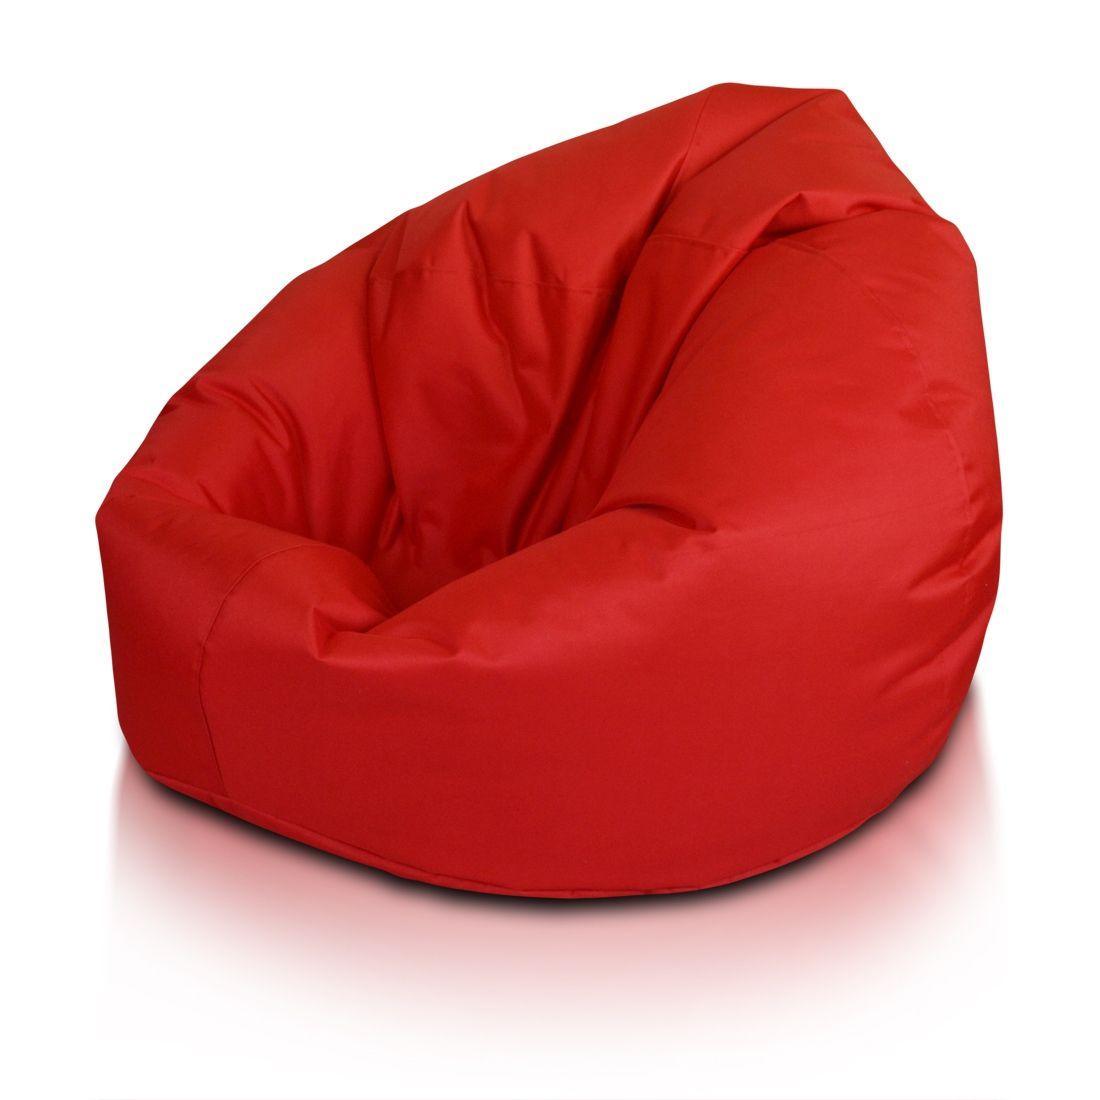 sitzsack sakwa m super bezug fr einen sitzsack sessel polyester - Planner Sessel